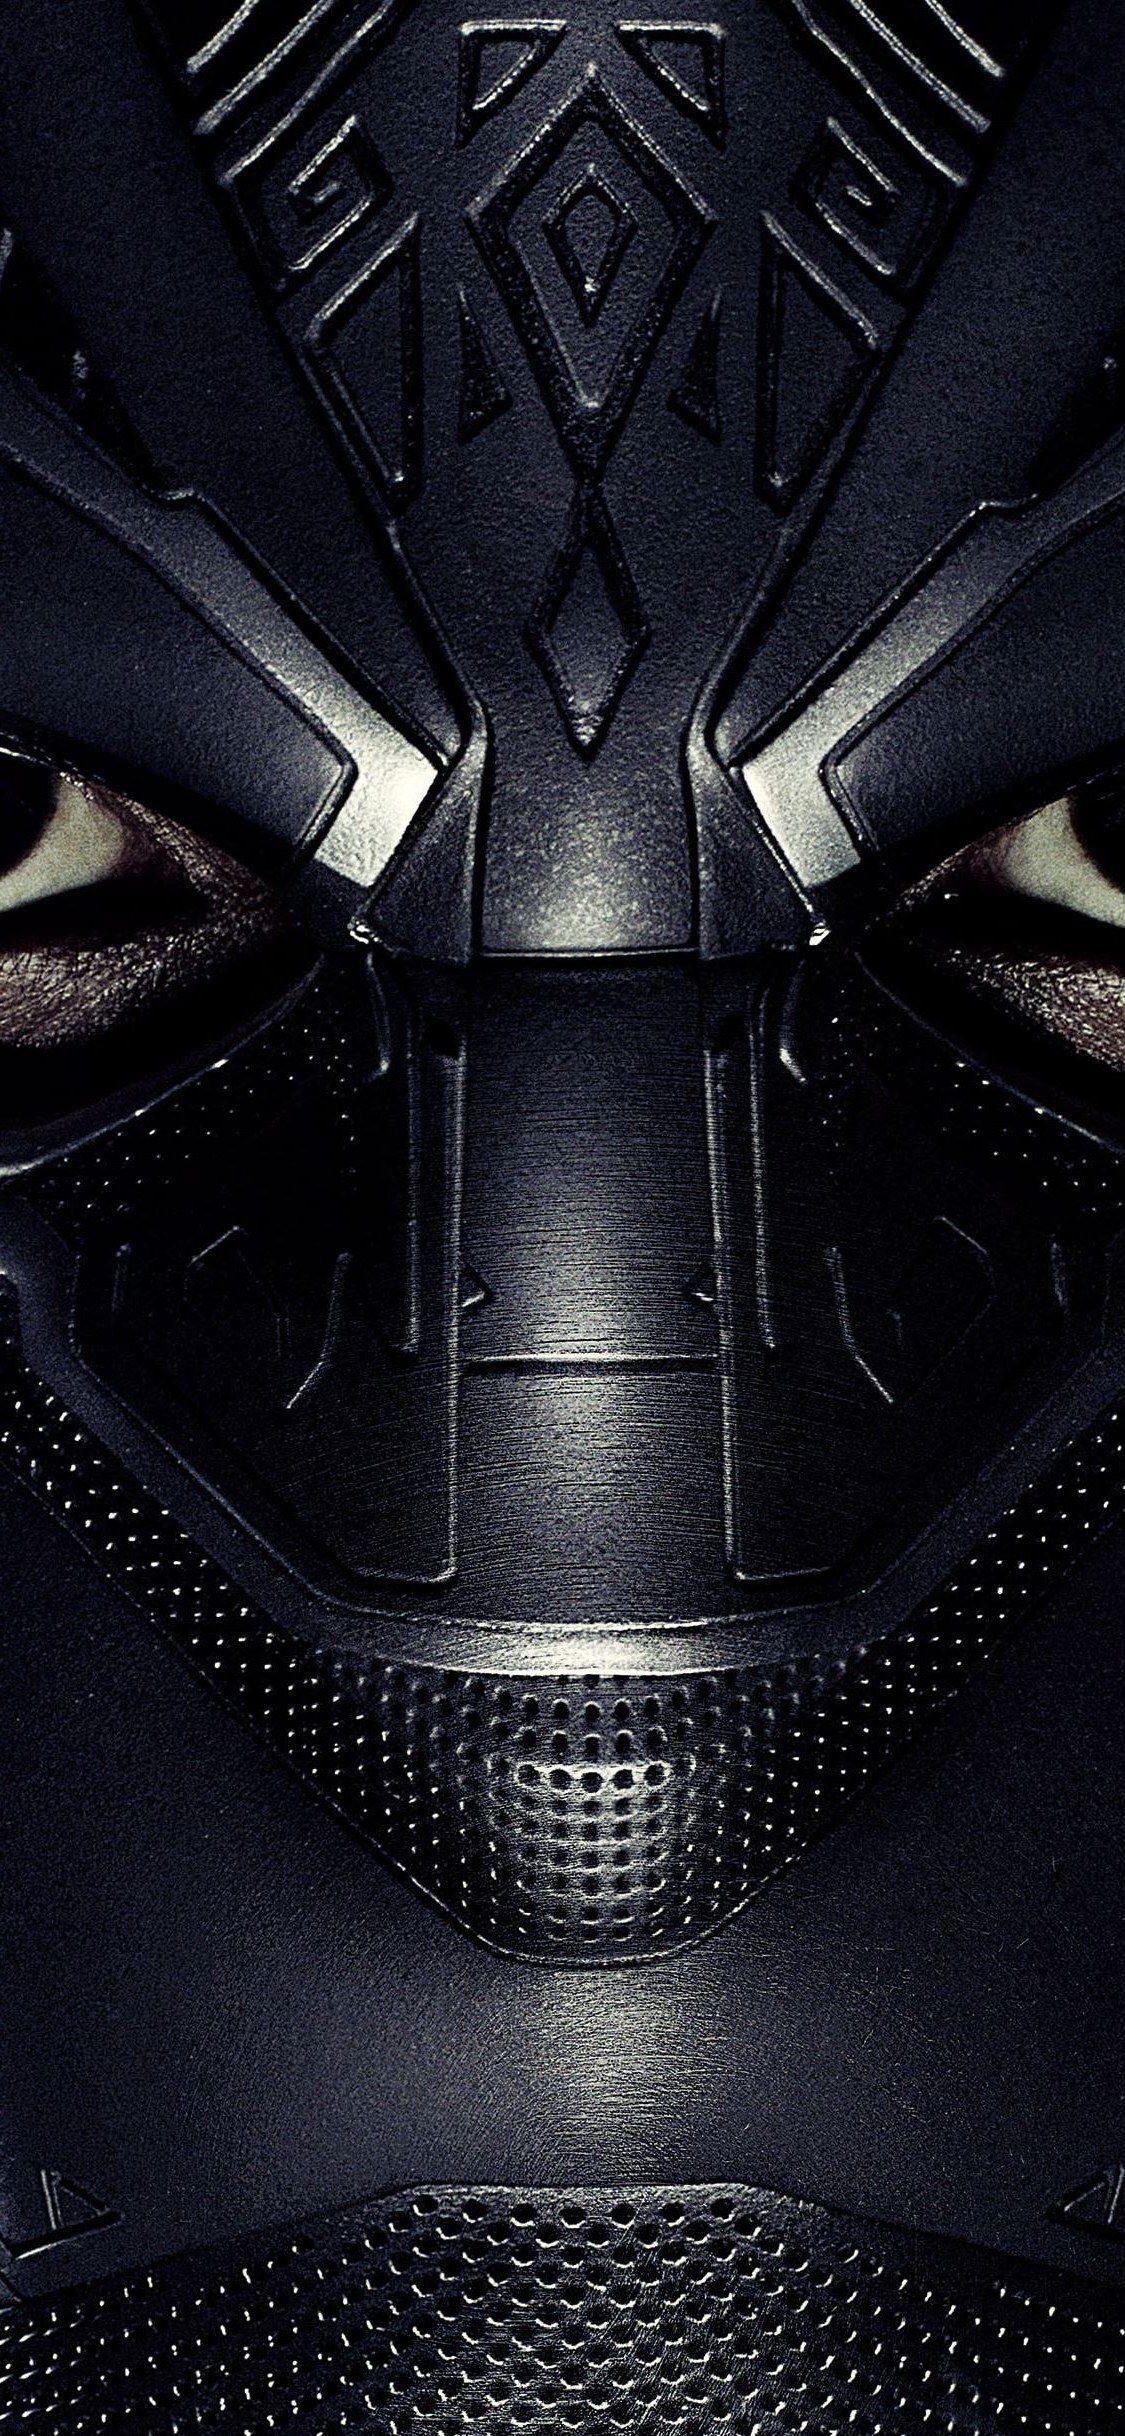 black panther marvel comics hd wallpaper Iphone X